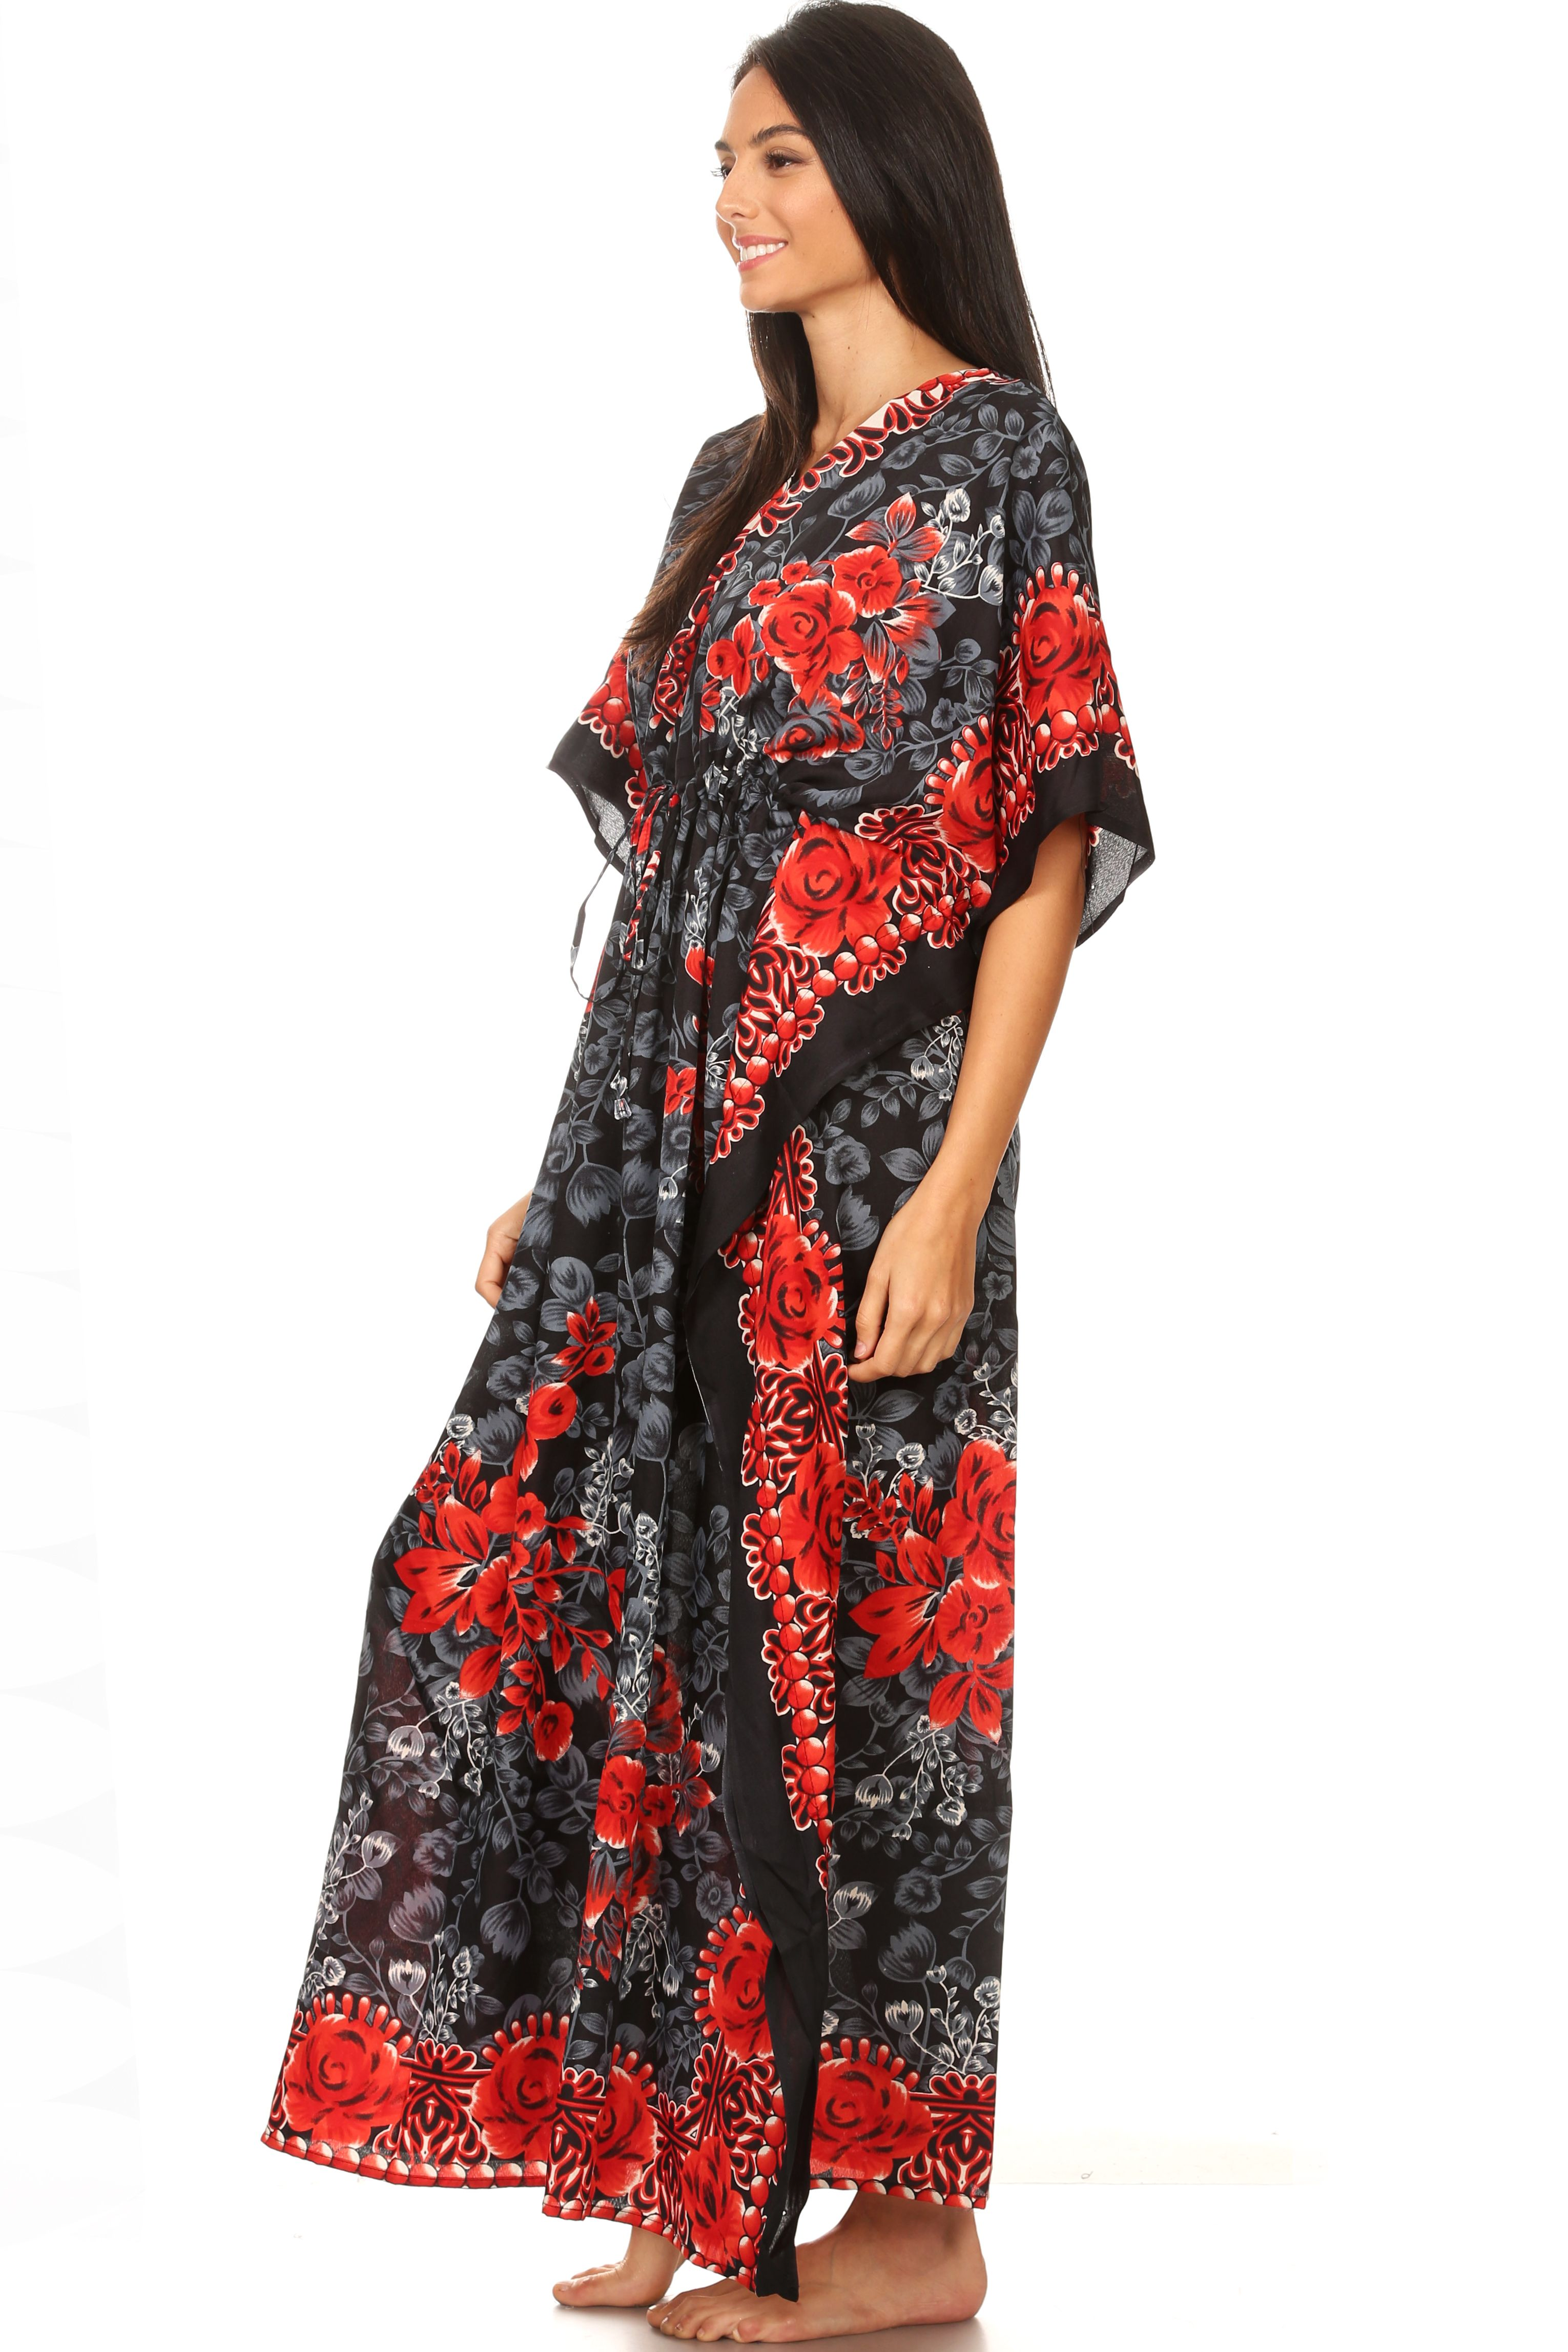 Caftan Dresses For Women V Neck Long Kaftan Cover Up Summer Maxi Dress Ad Neck Spon Long Women In 2020 Summer Maxi Dress Maxi Dress Womens Dresses [ 4590 x 3060 Pixel ]